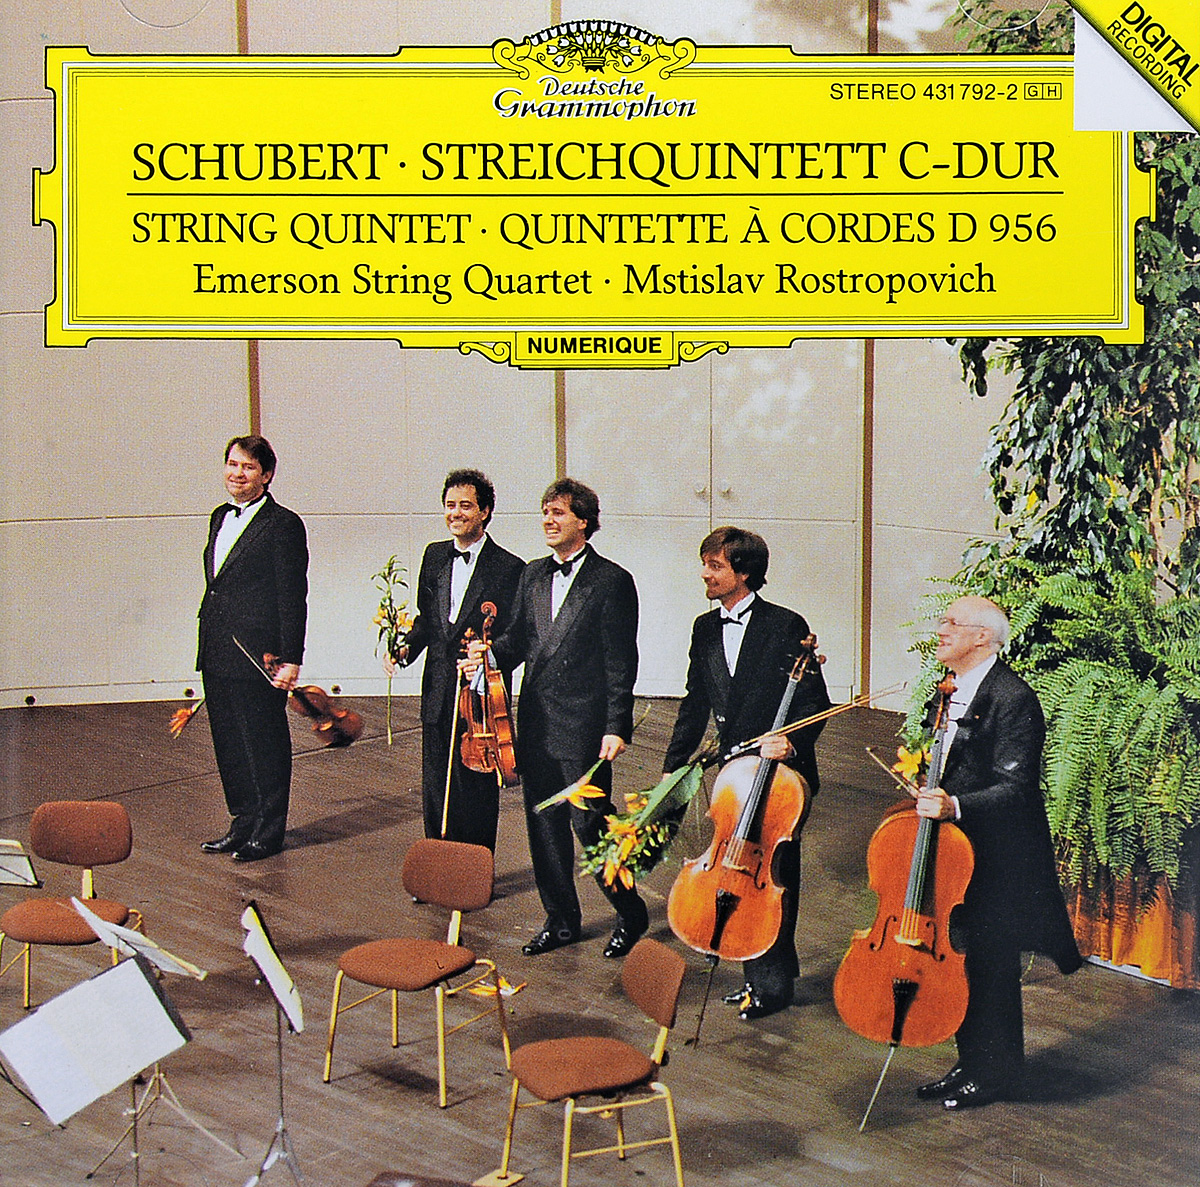 цена на Schubert. Emerson String Quartet. Mstislav Rostropovich. Streichquintett C-dur (String Quintet · Quintette А Cordes D 956)